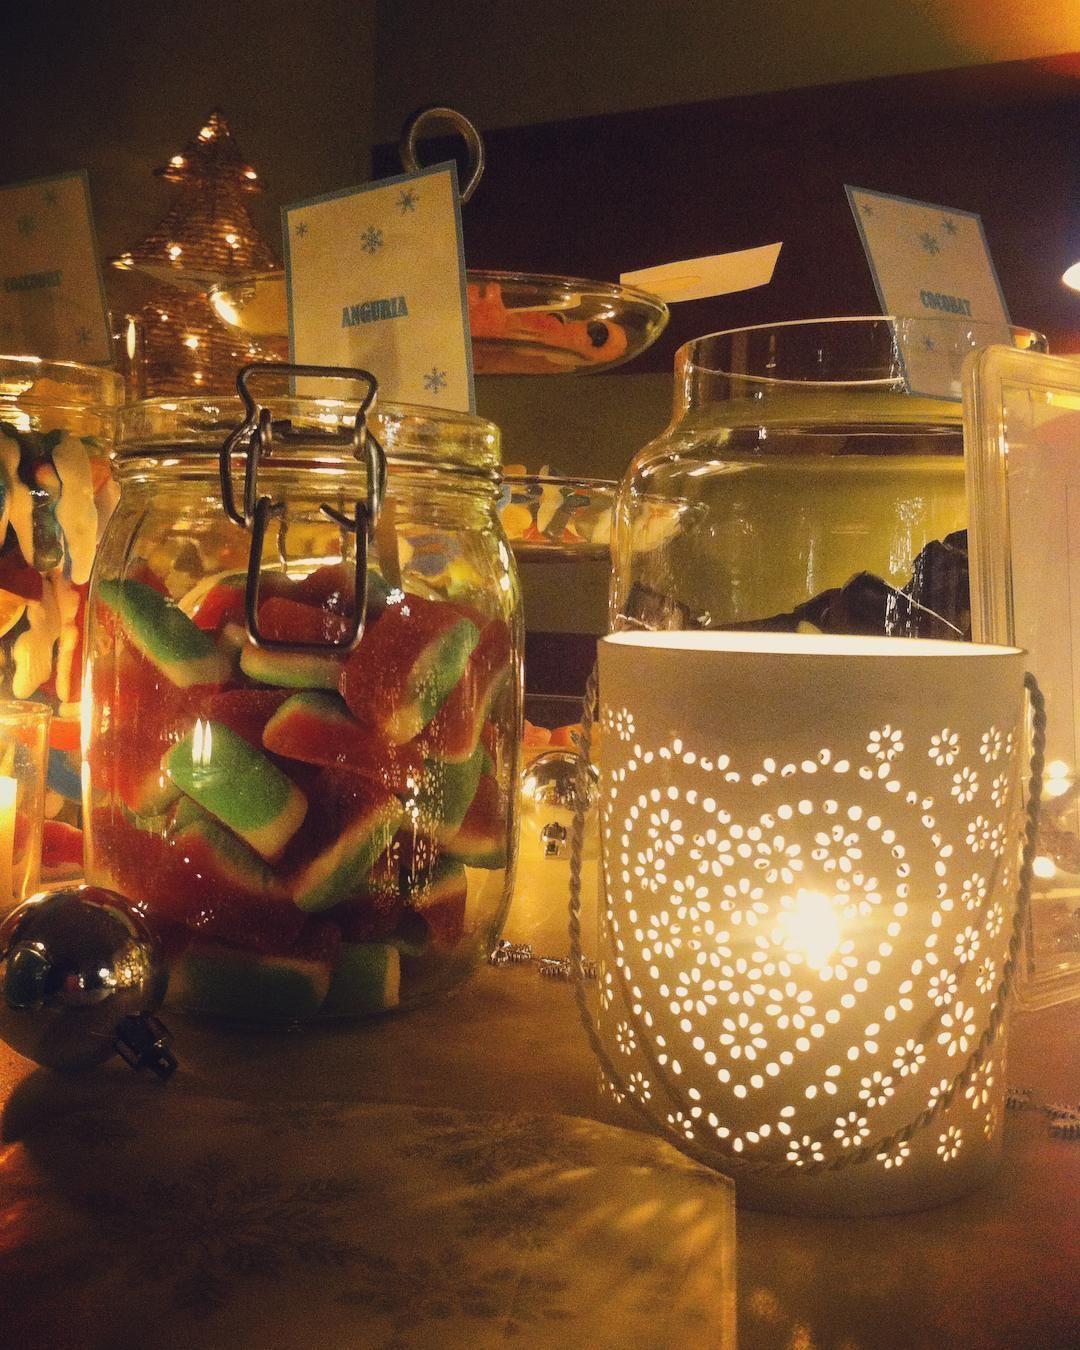 Sweet moments #weddingday #weddingtime #Event_ualmente #instawedding #bergamo #igersbergamo #IlariaFrancesco #weddingdecor #fattocolcuore #confettata #sweettable #candele #lights #caramelle #allestimento #matrimonio #cool #igerslombardia #weddinginitaly